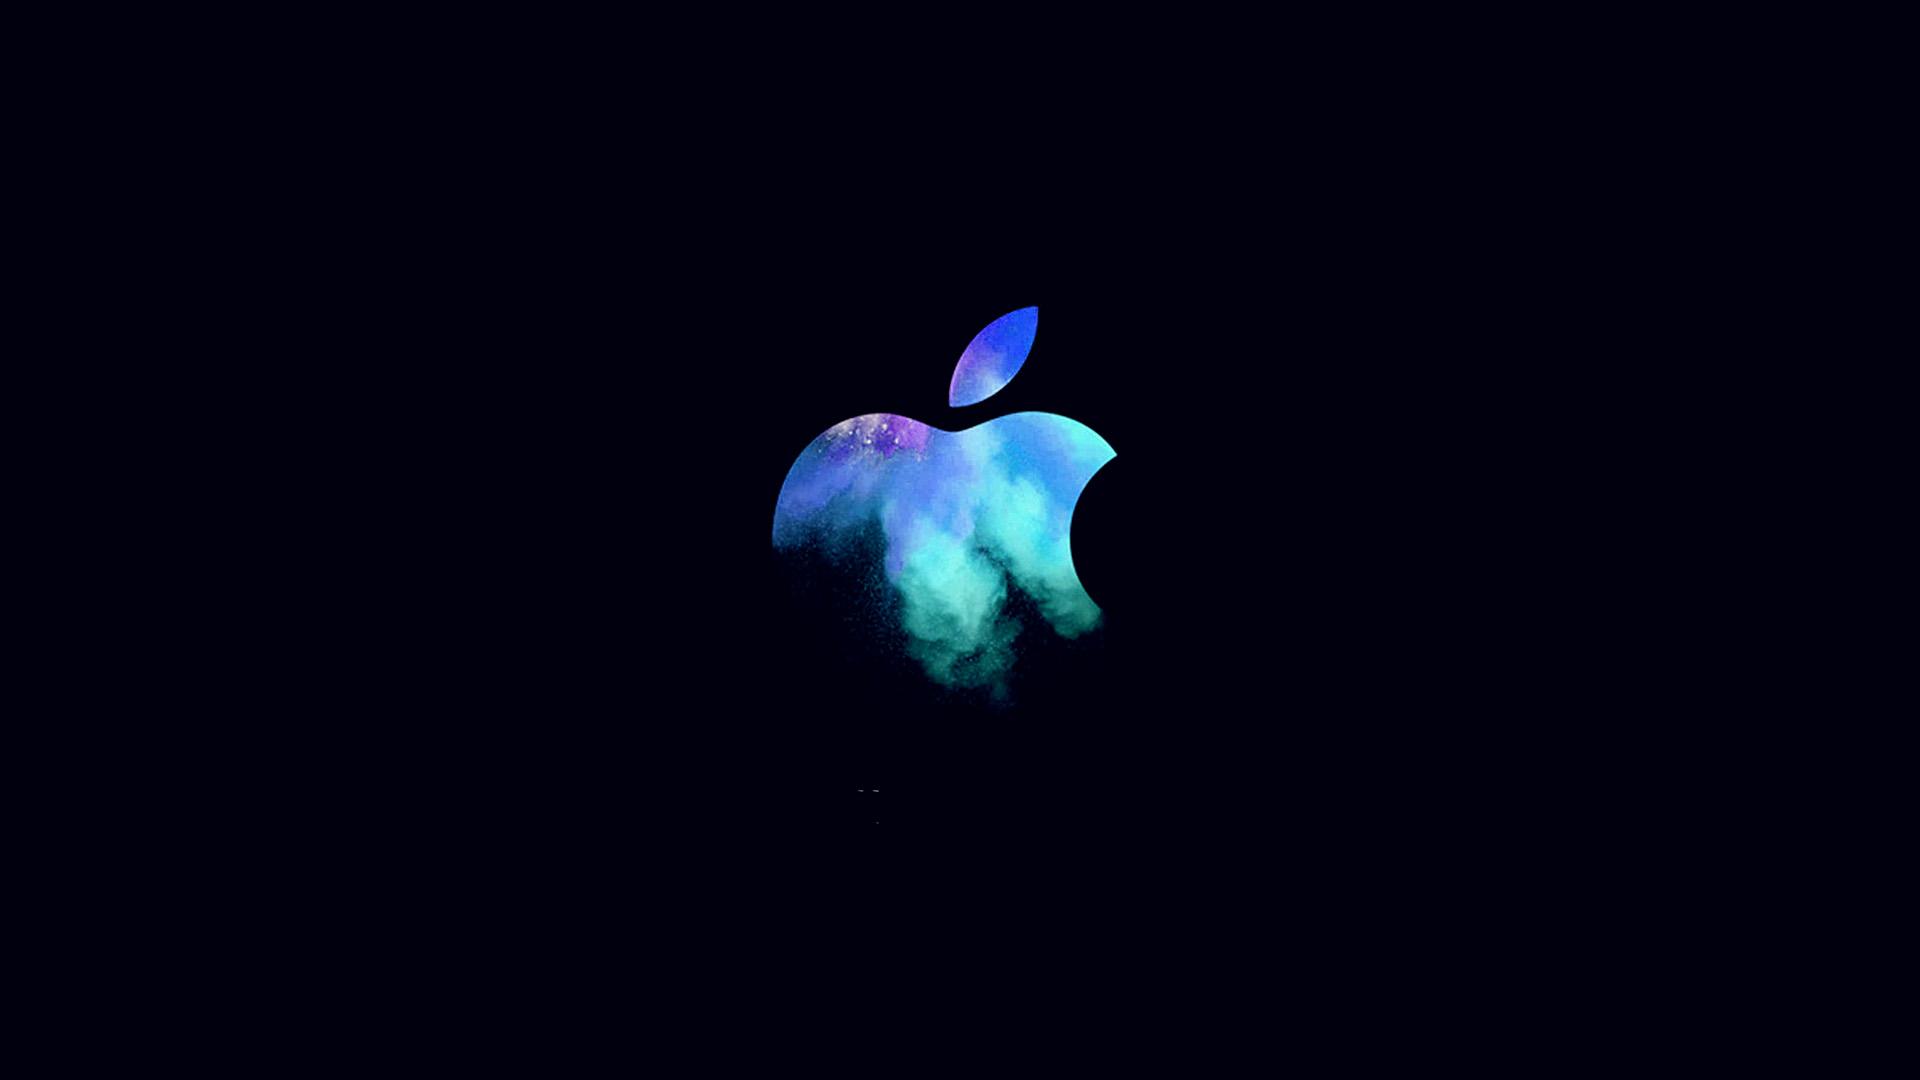 Fall Hd Wallpaper For Mac Au33 Apple Mac Event Logo Dark Illustration Art Blue Wallpaper